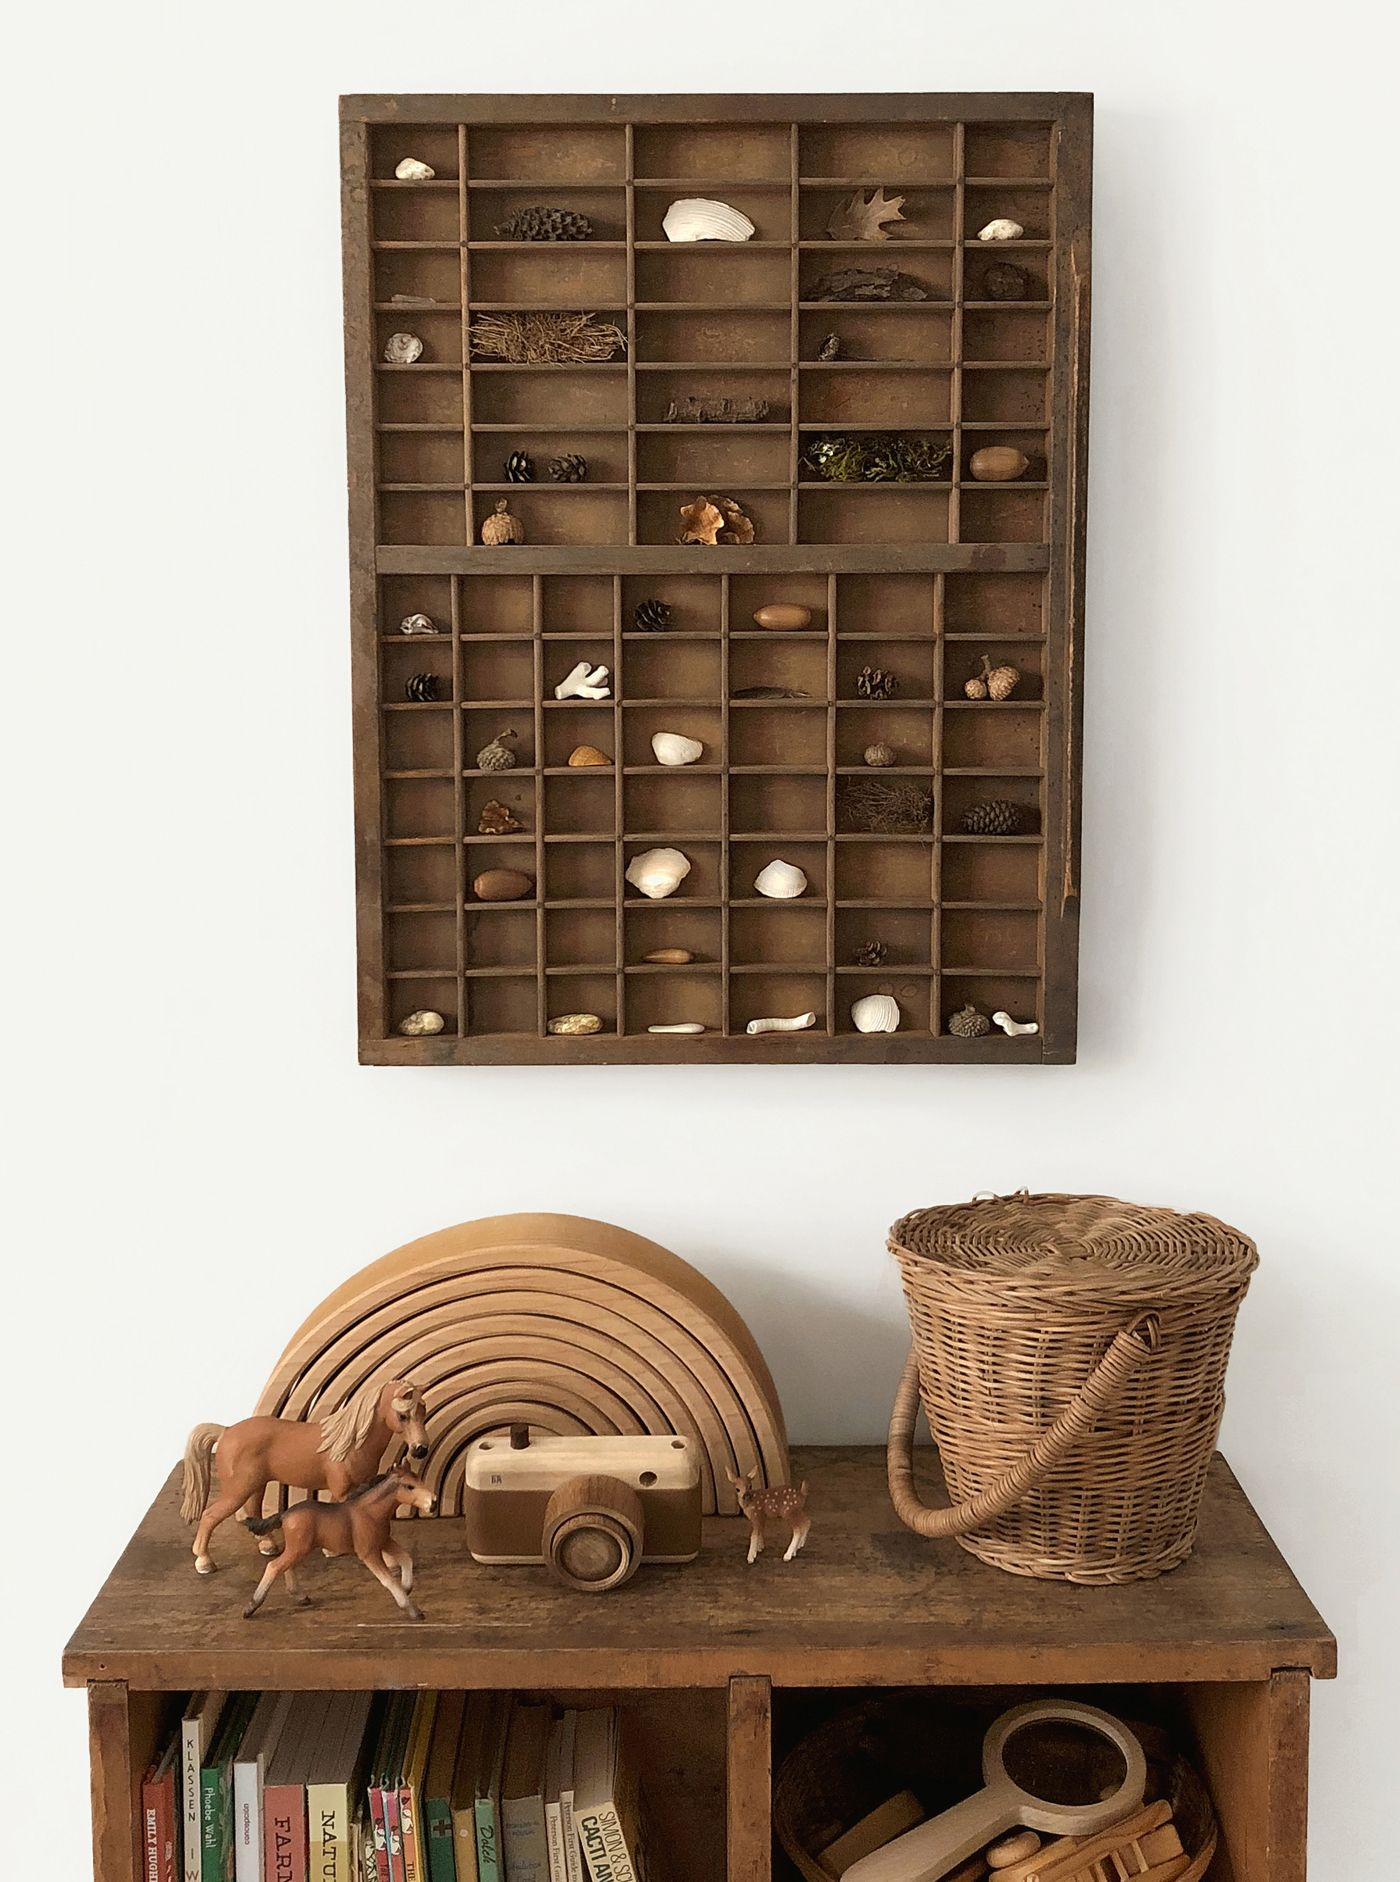 How To Set Up a Nature Shelf